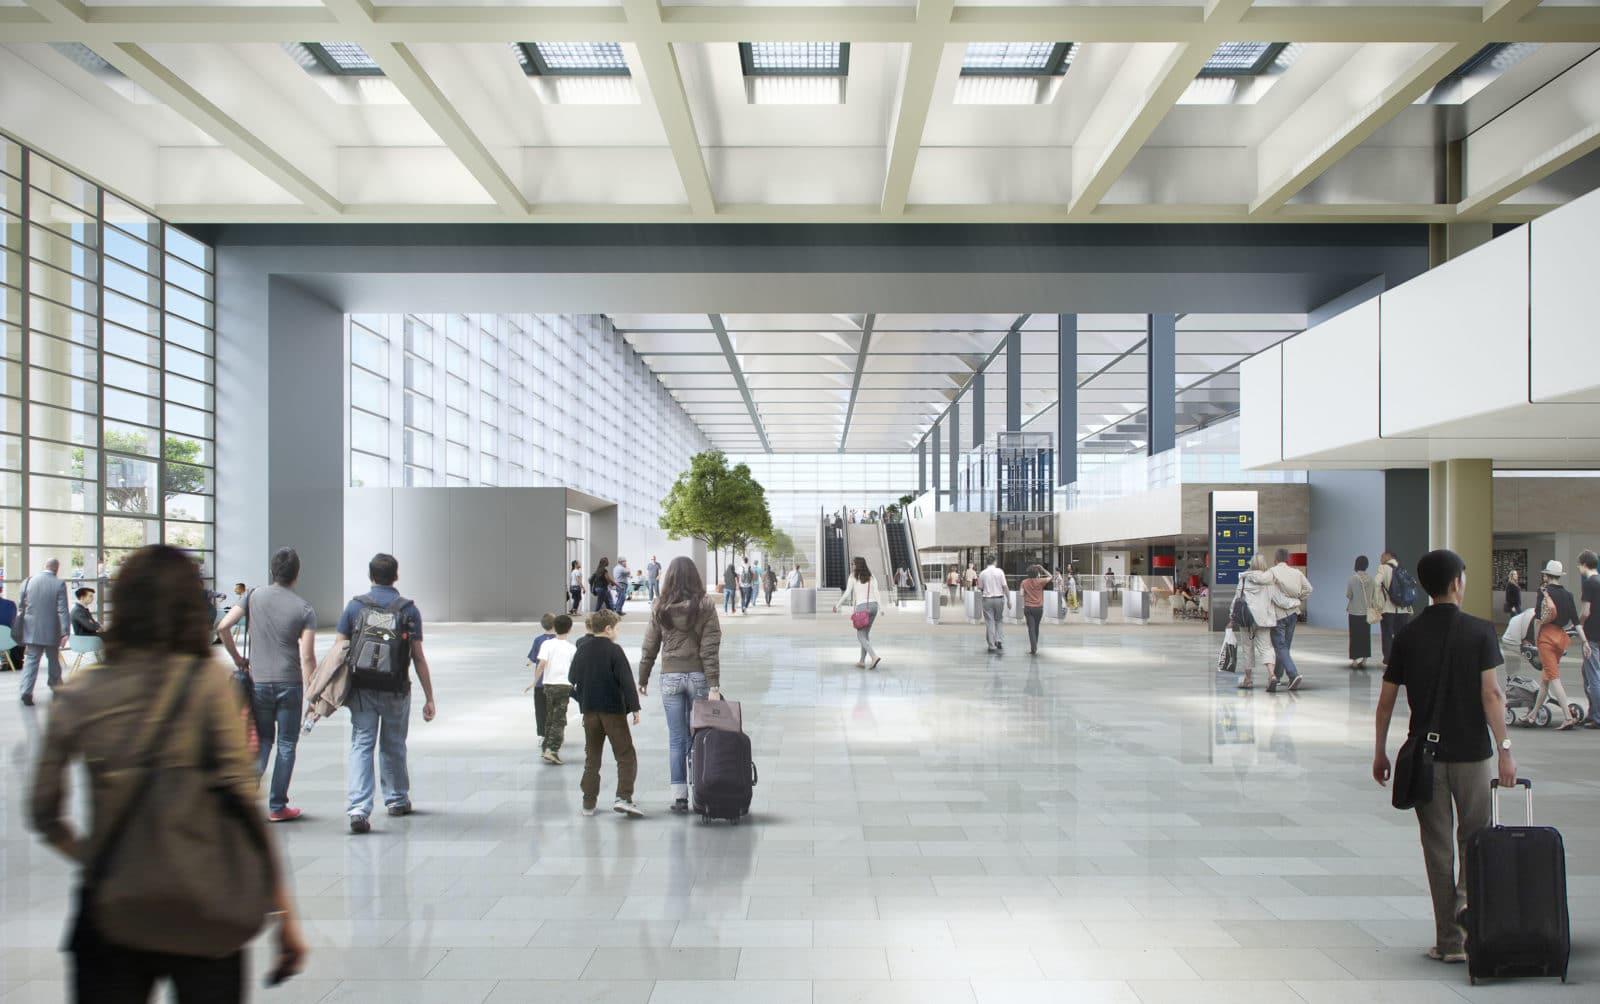 aeroport marseille extension foster 10